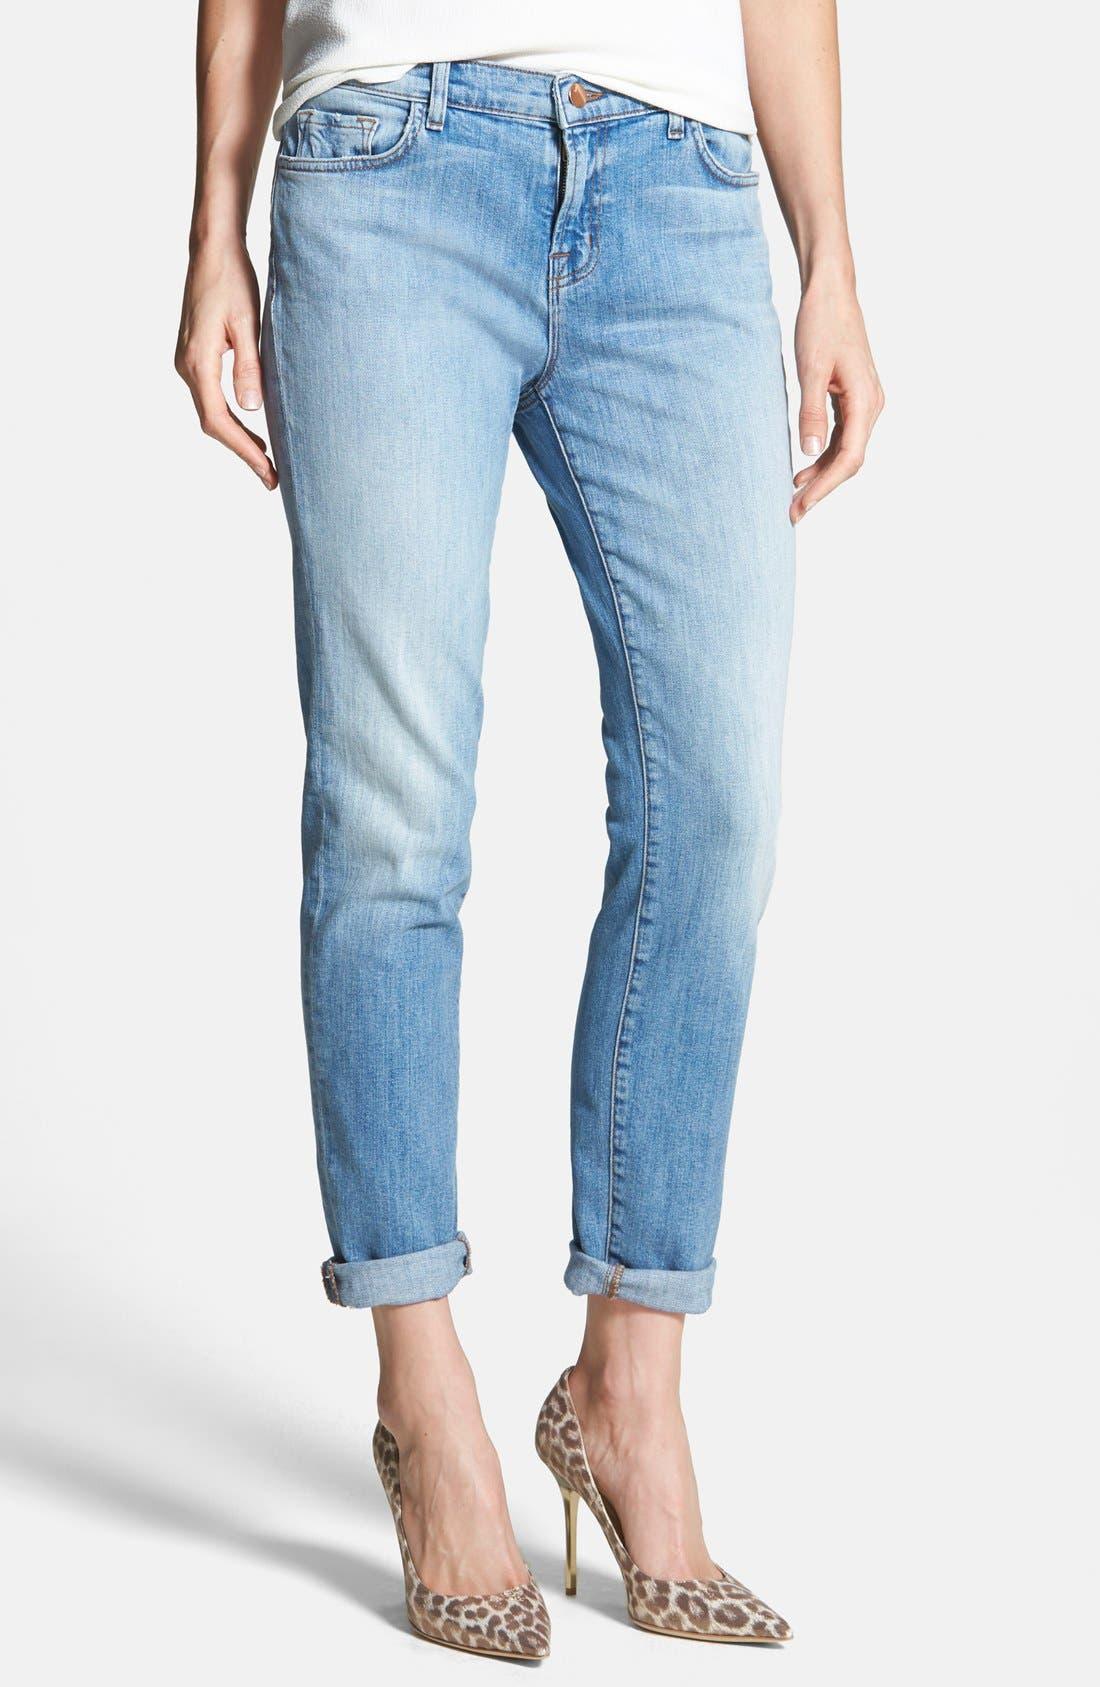 Alternate Image 1 Selected - J Brand 'Jake' Skinny Boyfriend Jeans (Eternal)